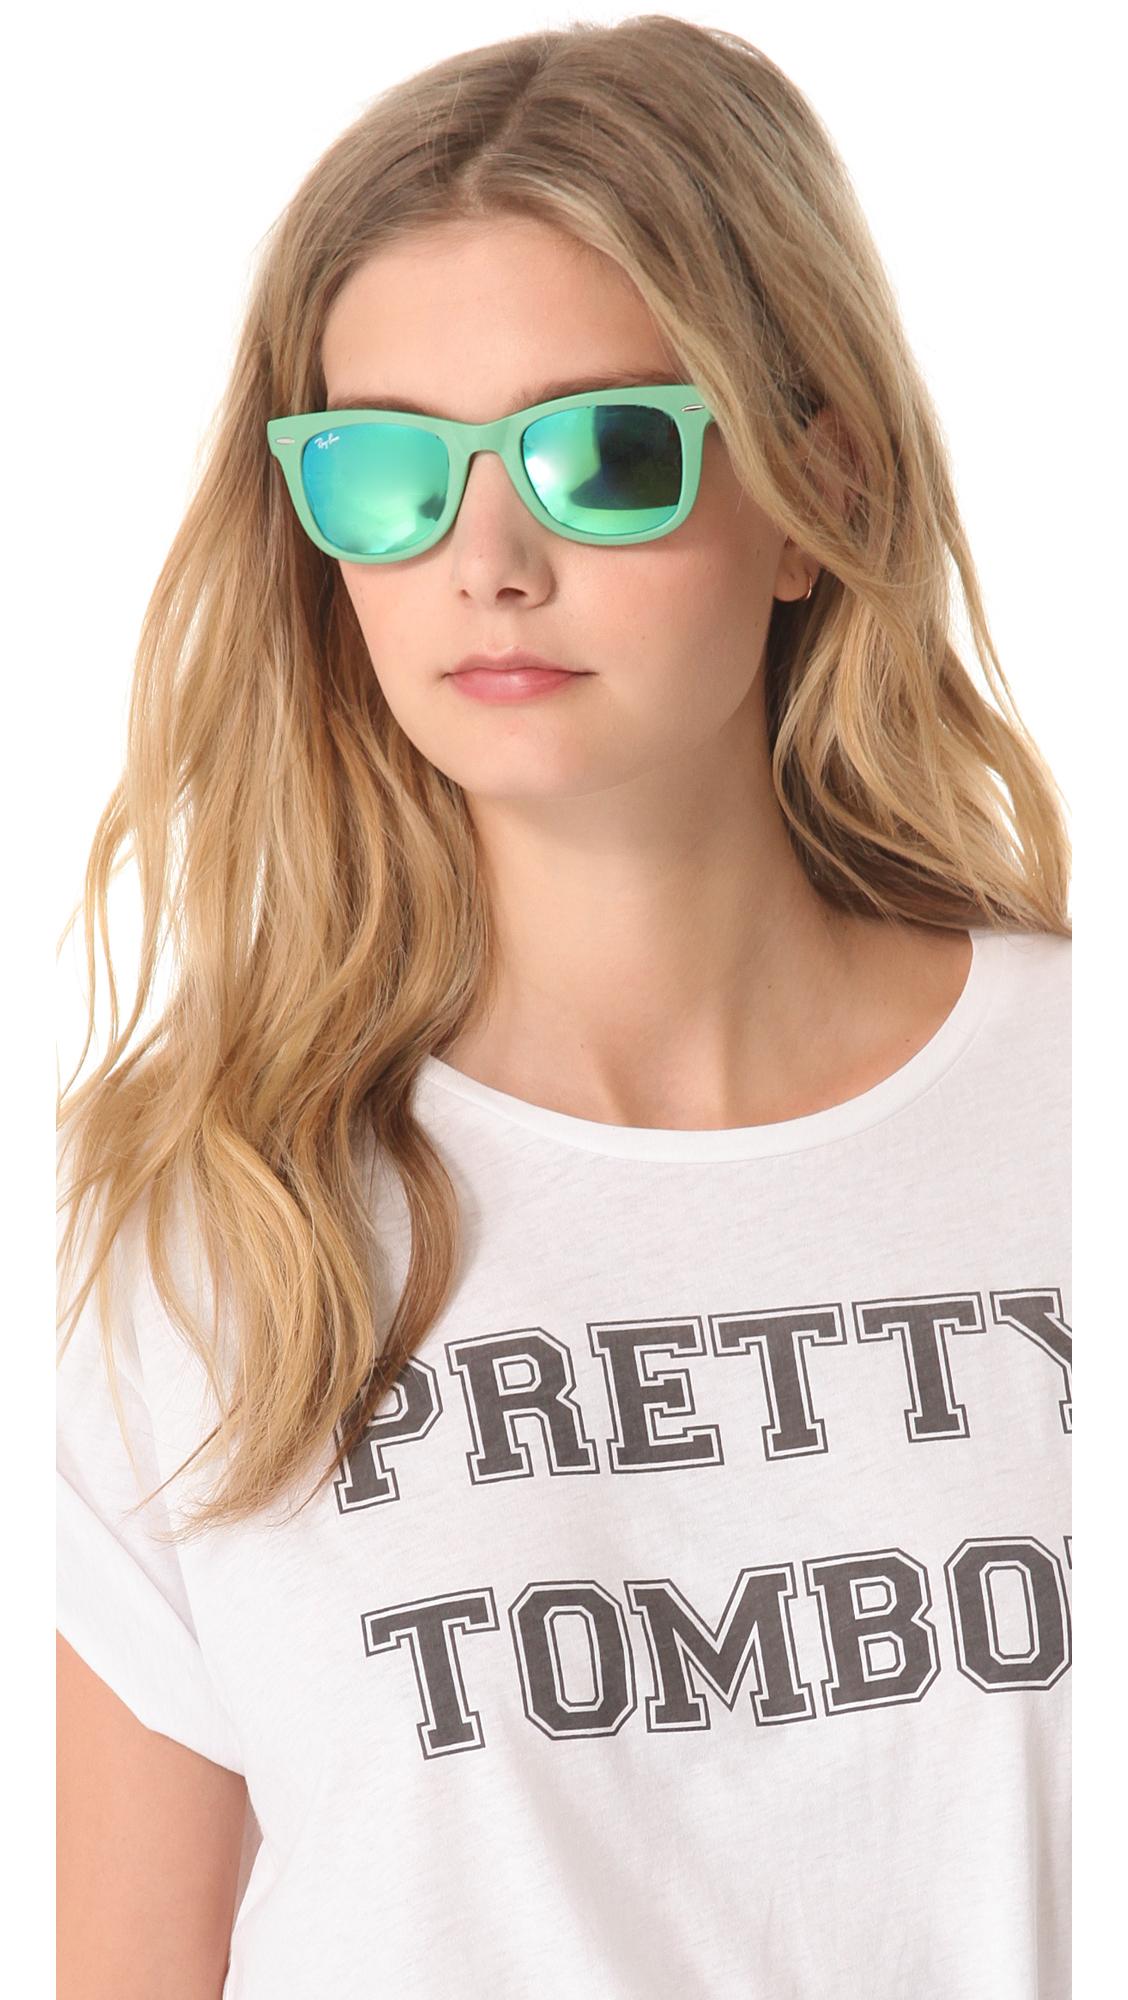 8ca3d484c ray ban wayfarer mirrored sunglasses - Holly's Restaurant and Pub